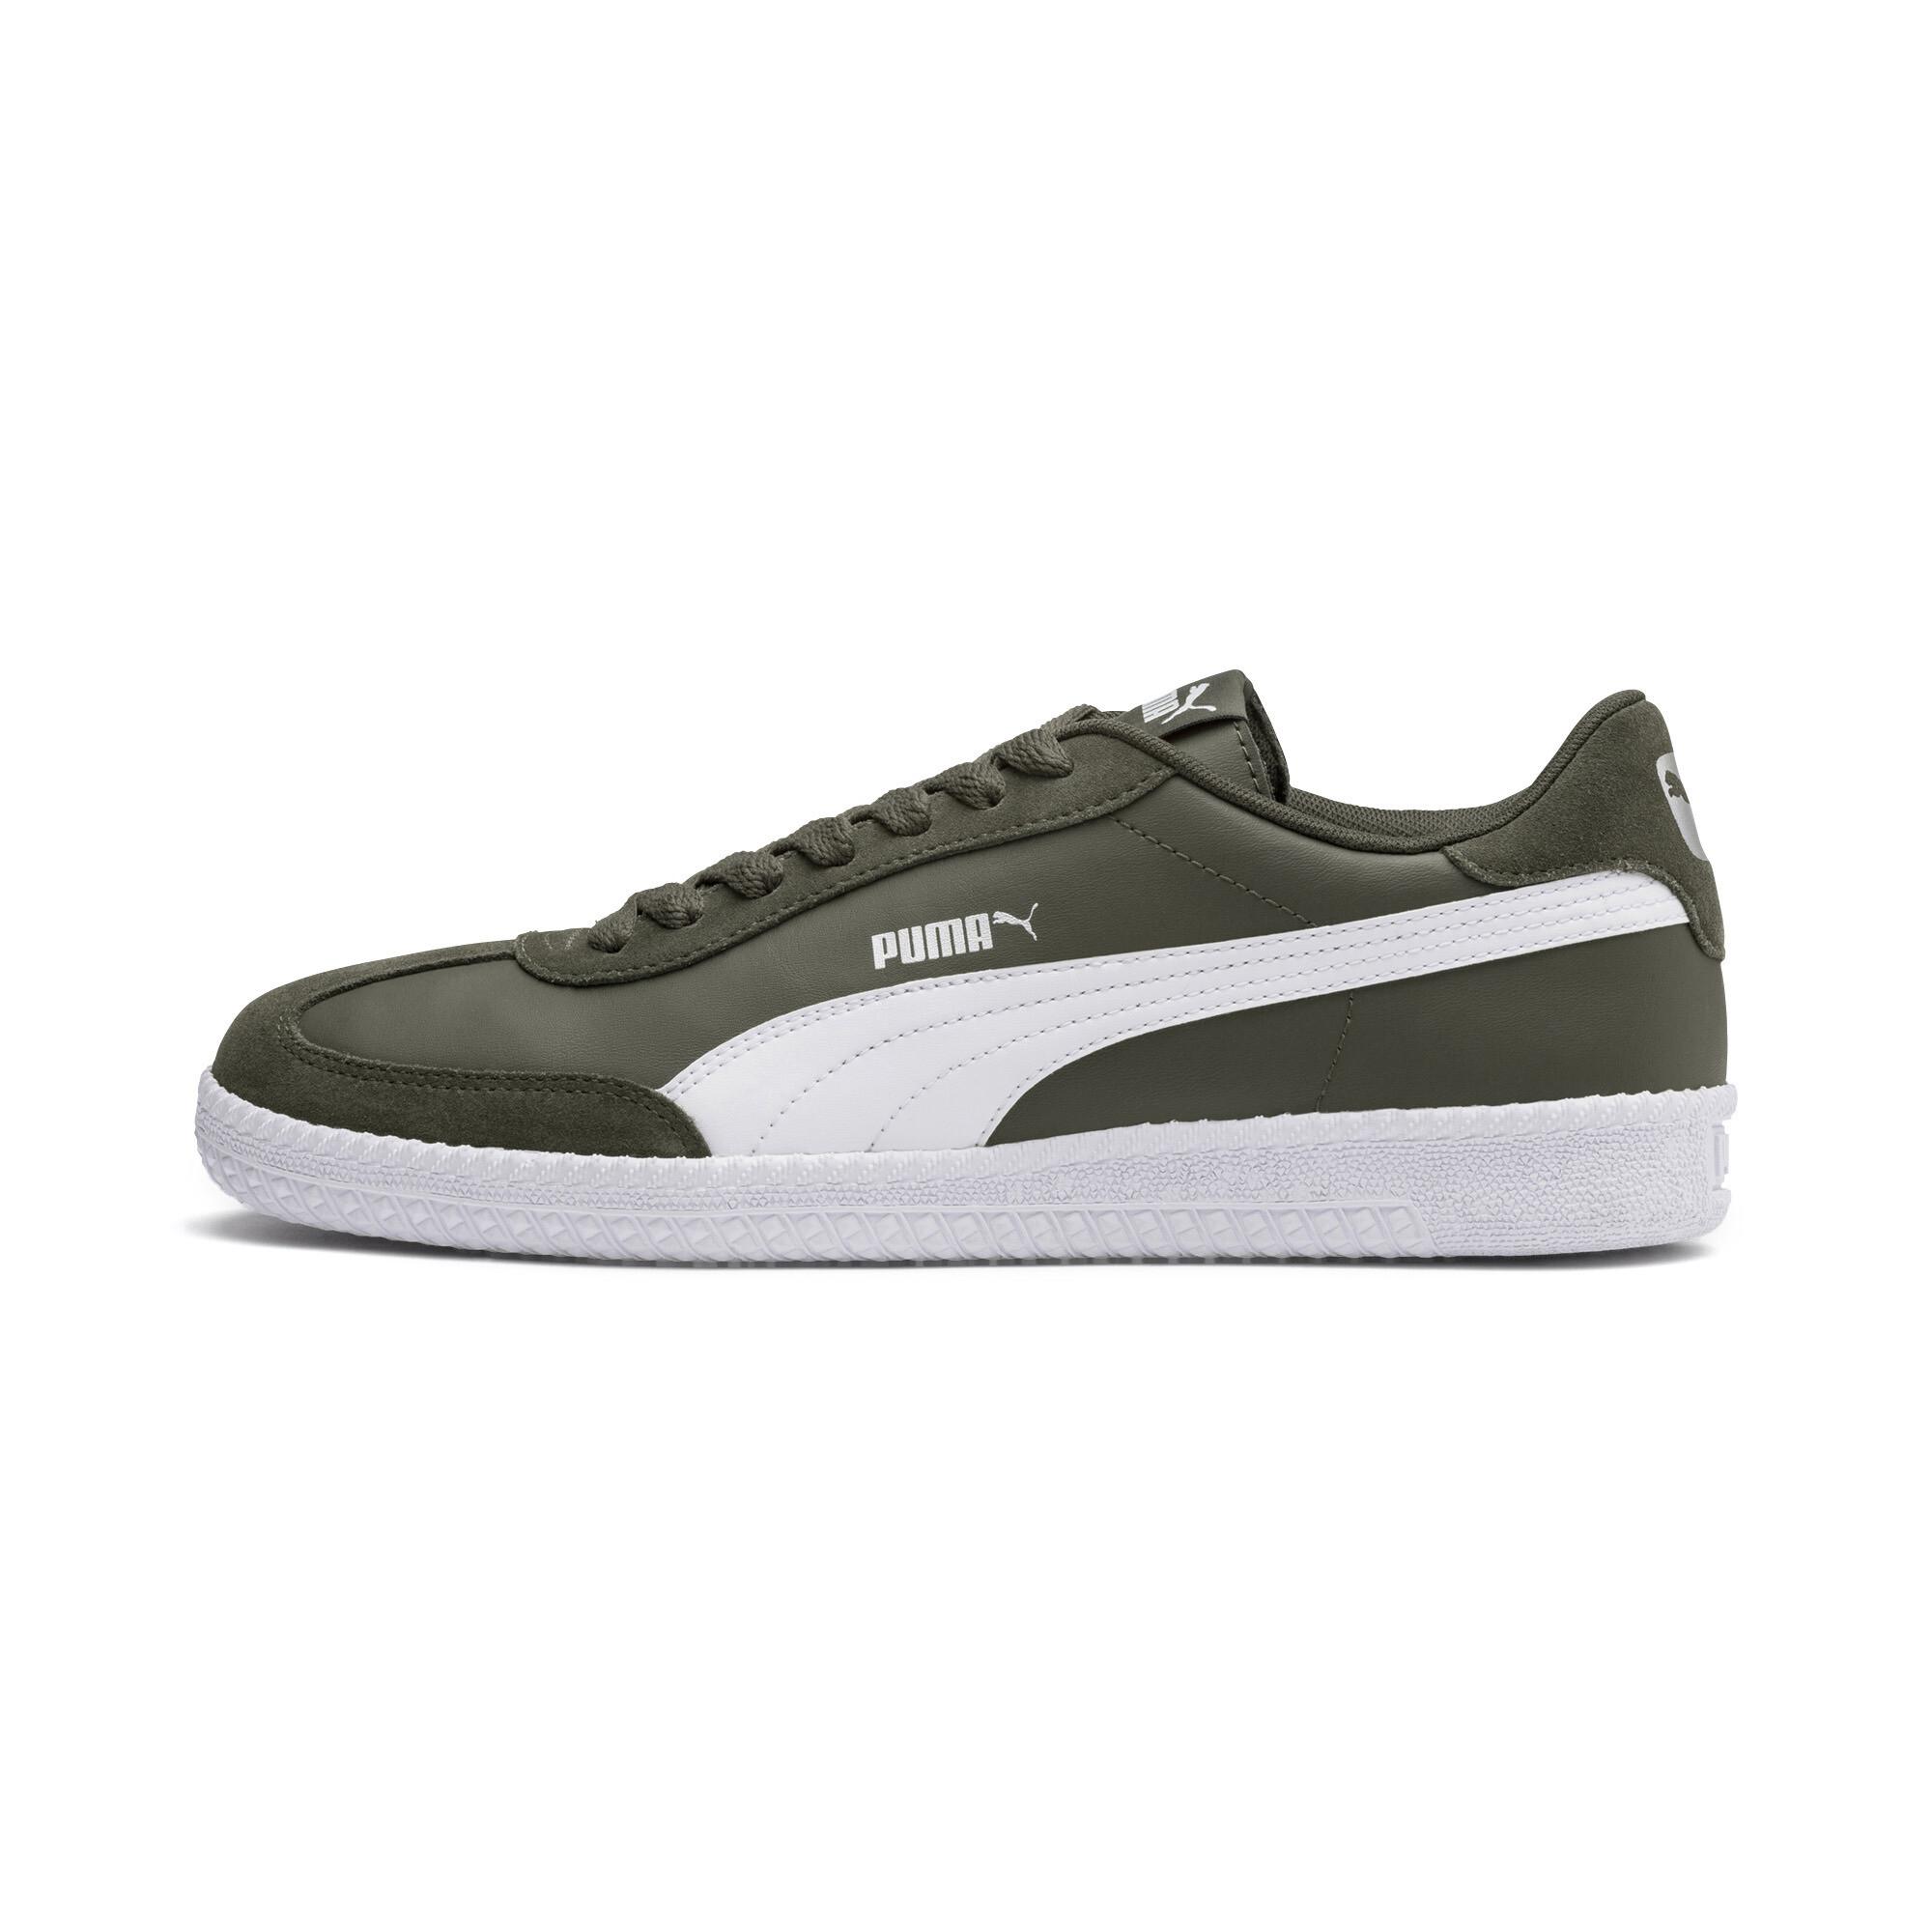 PUMA-Astro-Cup-Men-039-s-Sneakers-Men-Shoe-Basics thumbnail 4